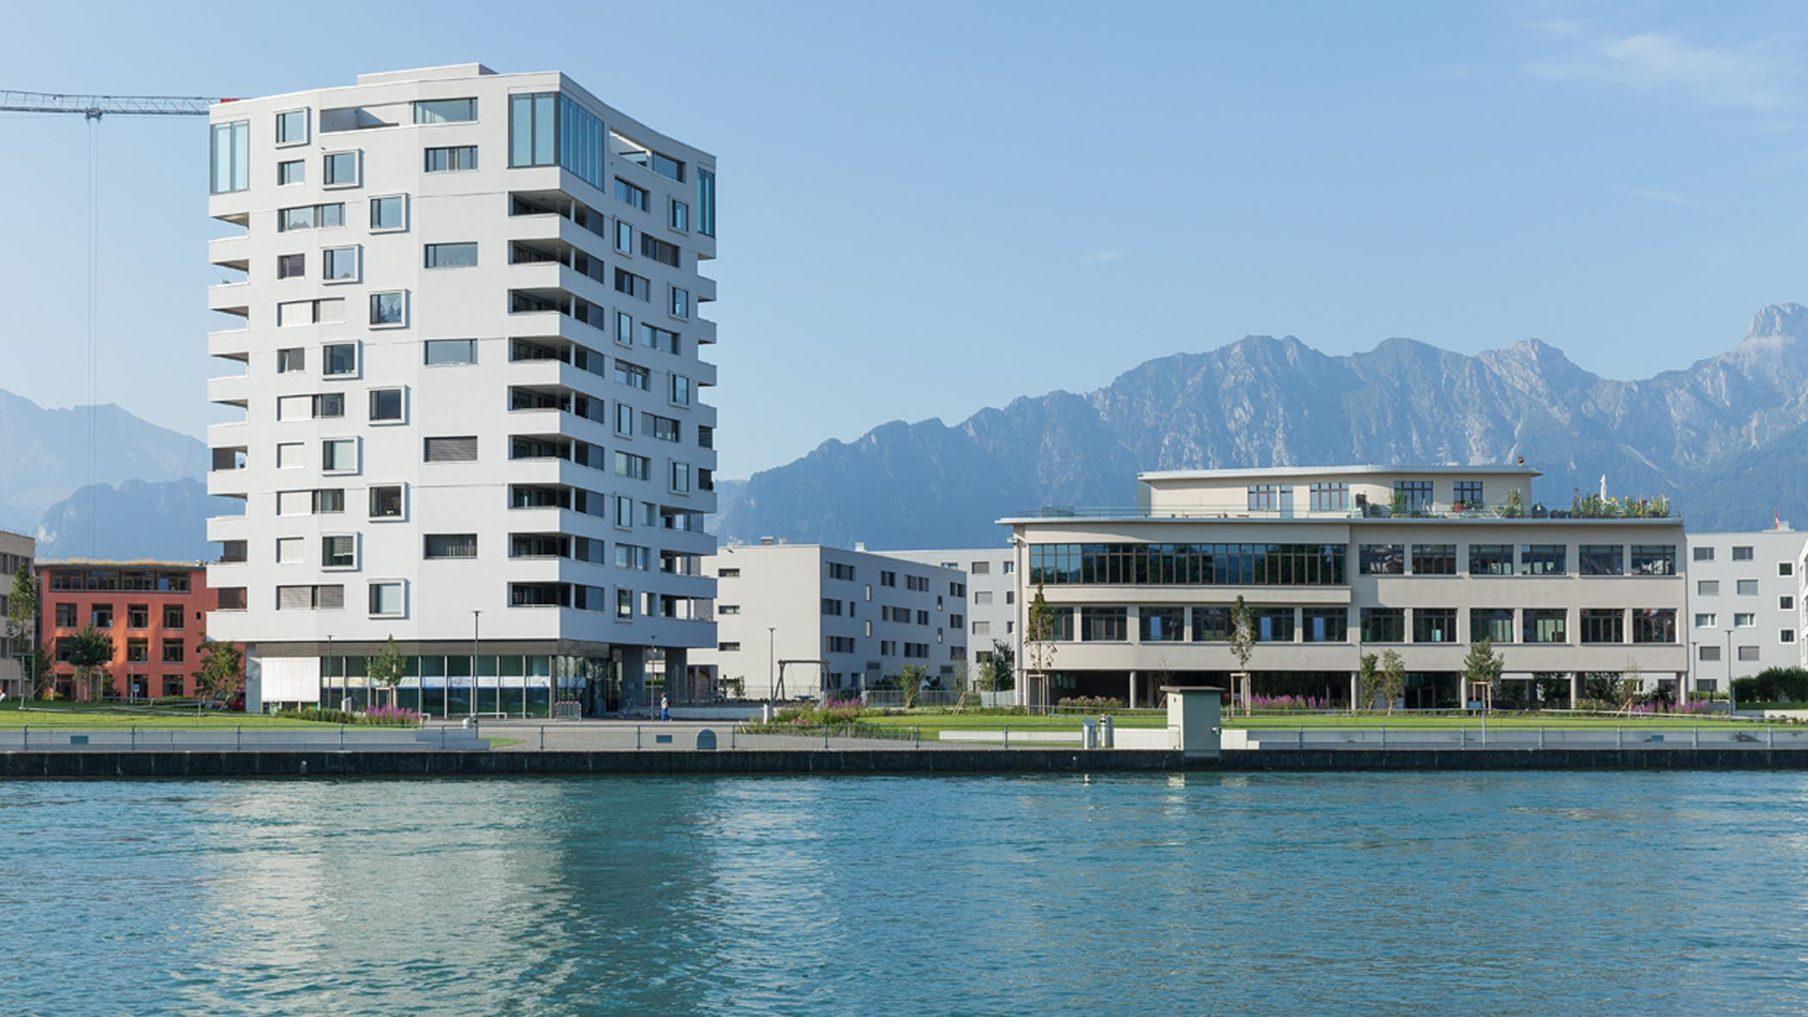 Wohn- und Geschäftsräume Selve Thun (Fertigstellung 2010)